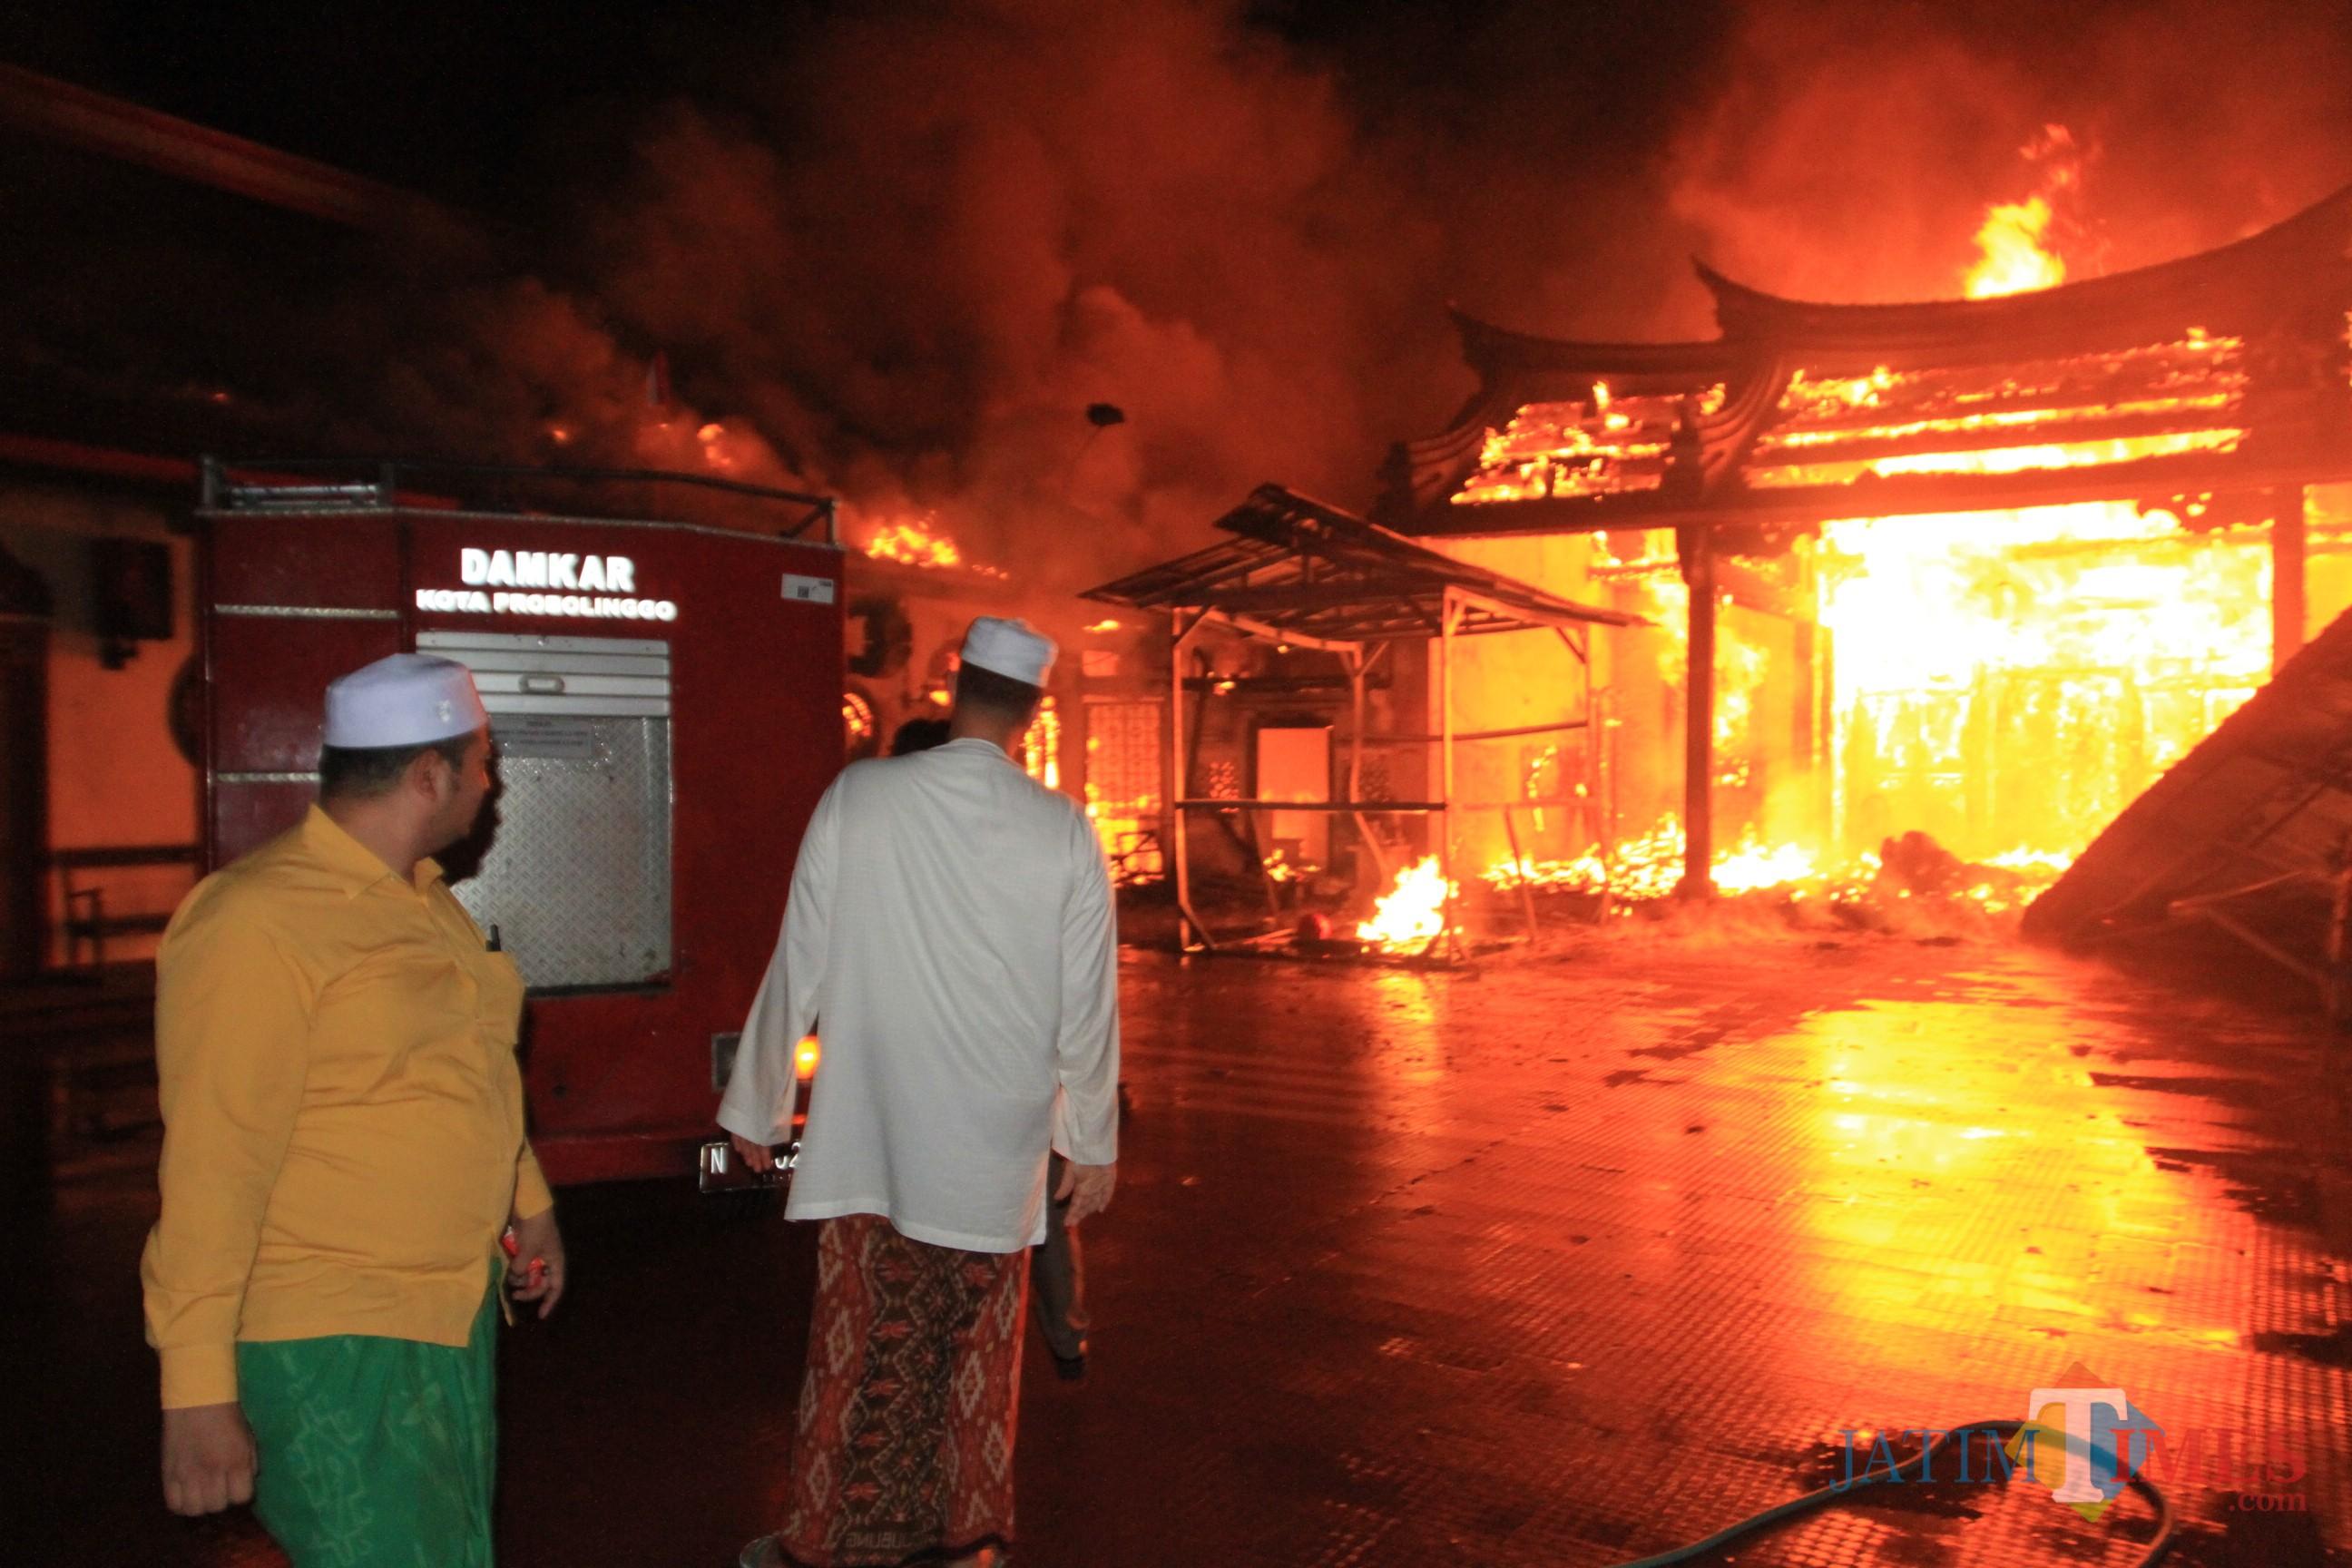 Wali Kota Probolinggo Hadi Zainal Abidin melihat dari dekat kebakaran klenteng Tri Dharma (Agus Salam/Jatim TIMES)